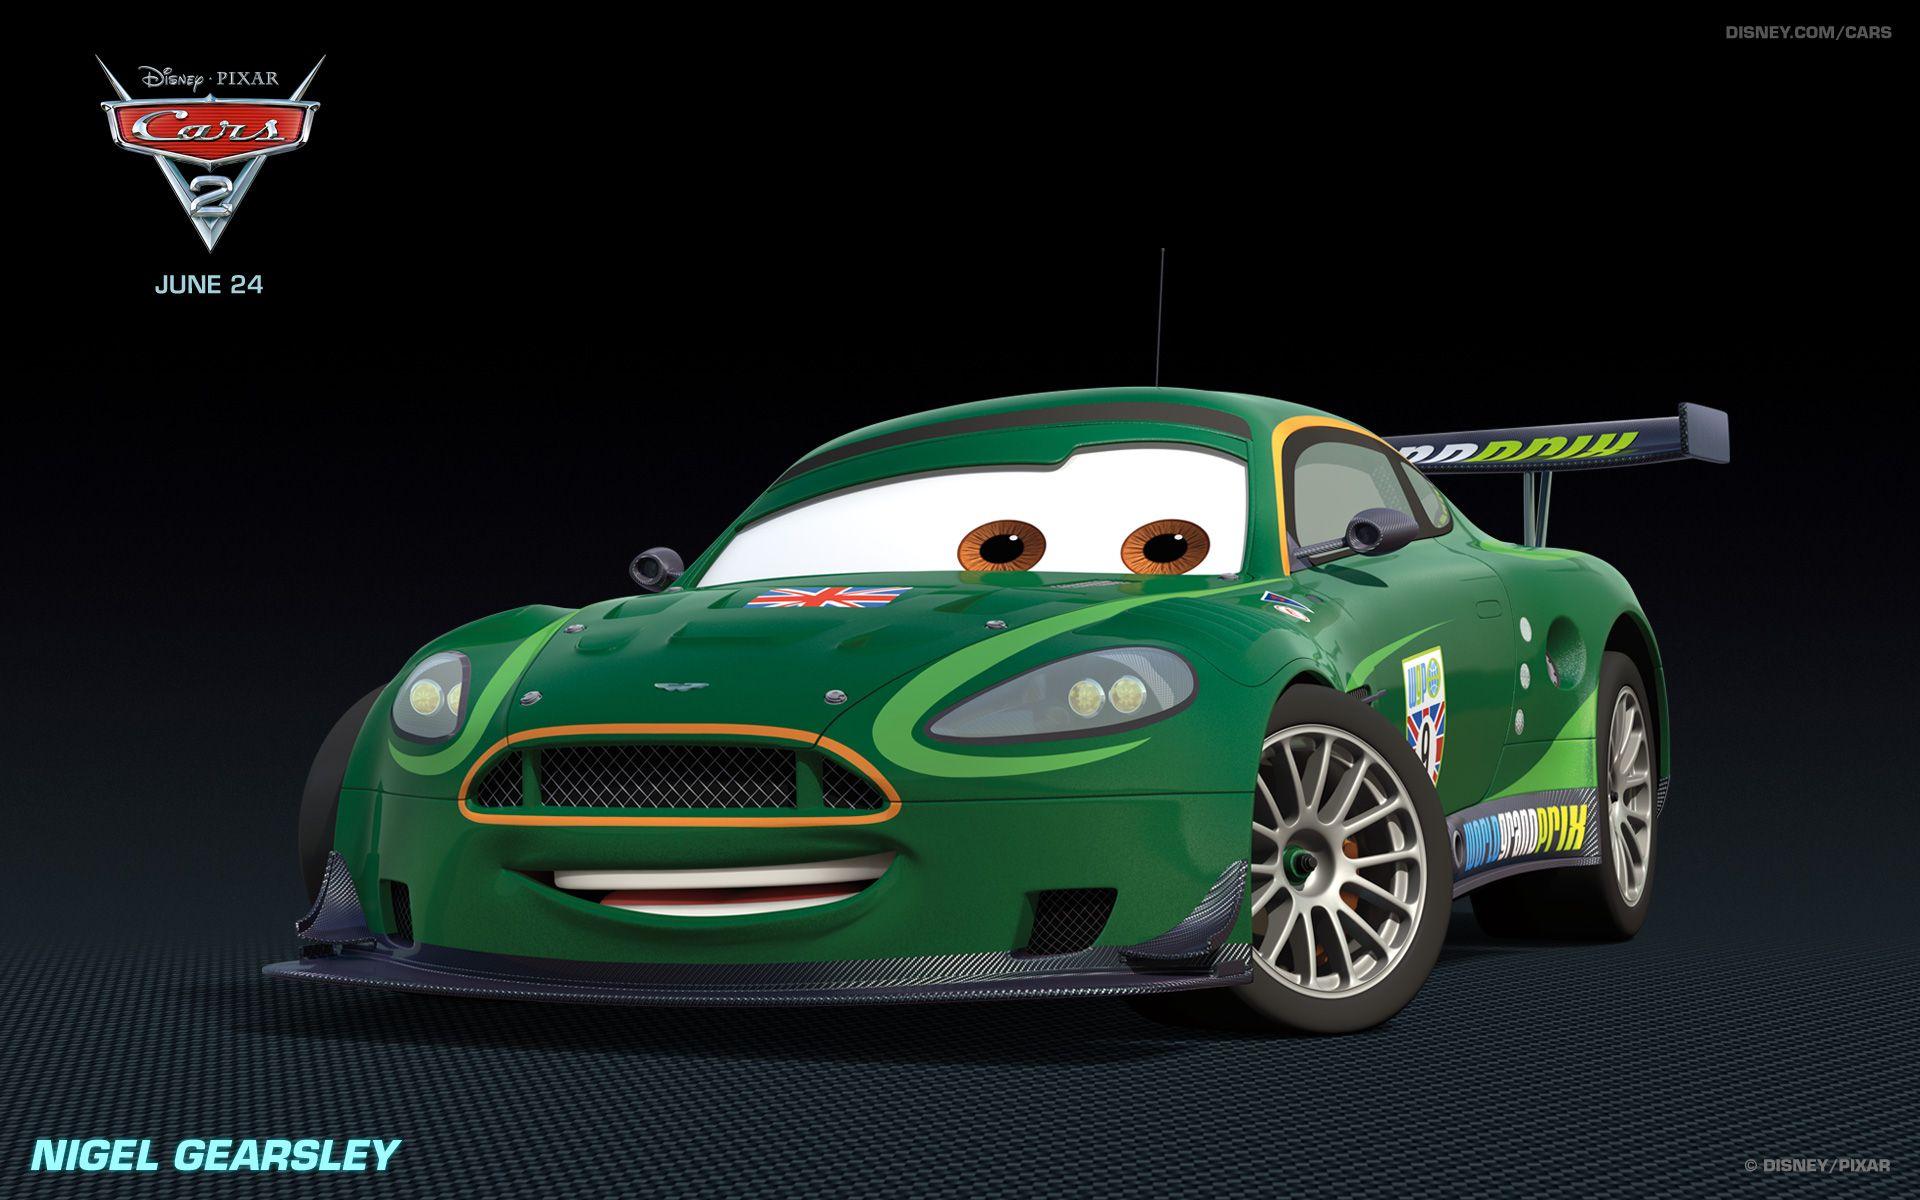 Beautiful Wallpaper Movie The Cars - 3e2a8dd99e830052c08d2e4d2084a40e  2018_291882.jpg